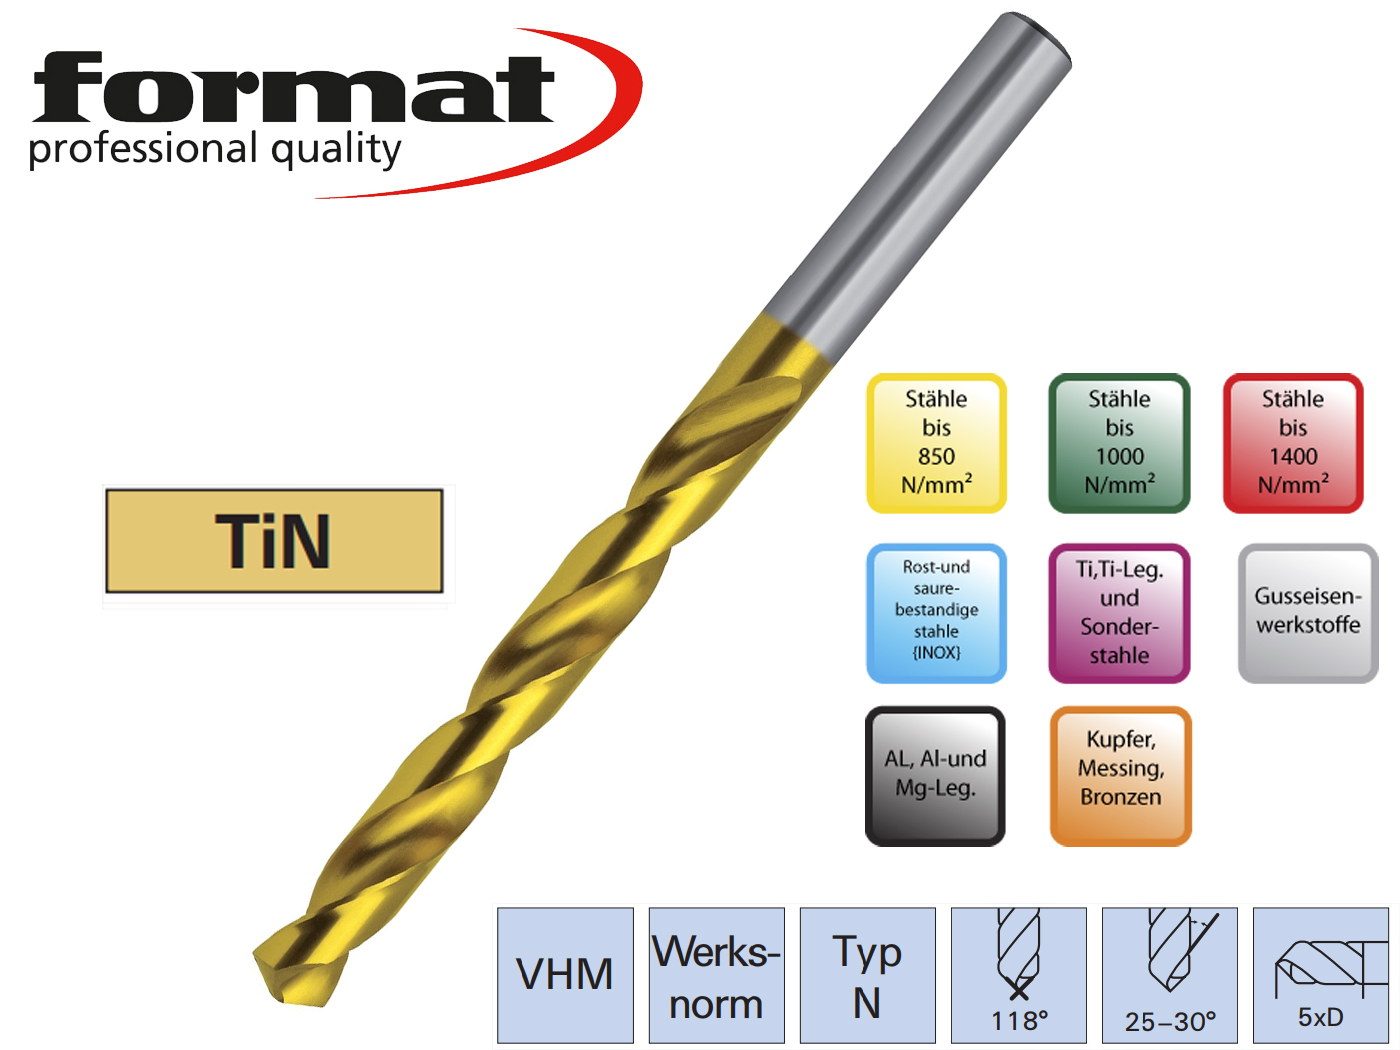 Spiraalboor VHM DIN 338 N VHM TiN   DKMTools - DKM Tools